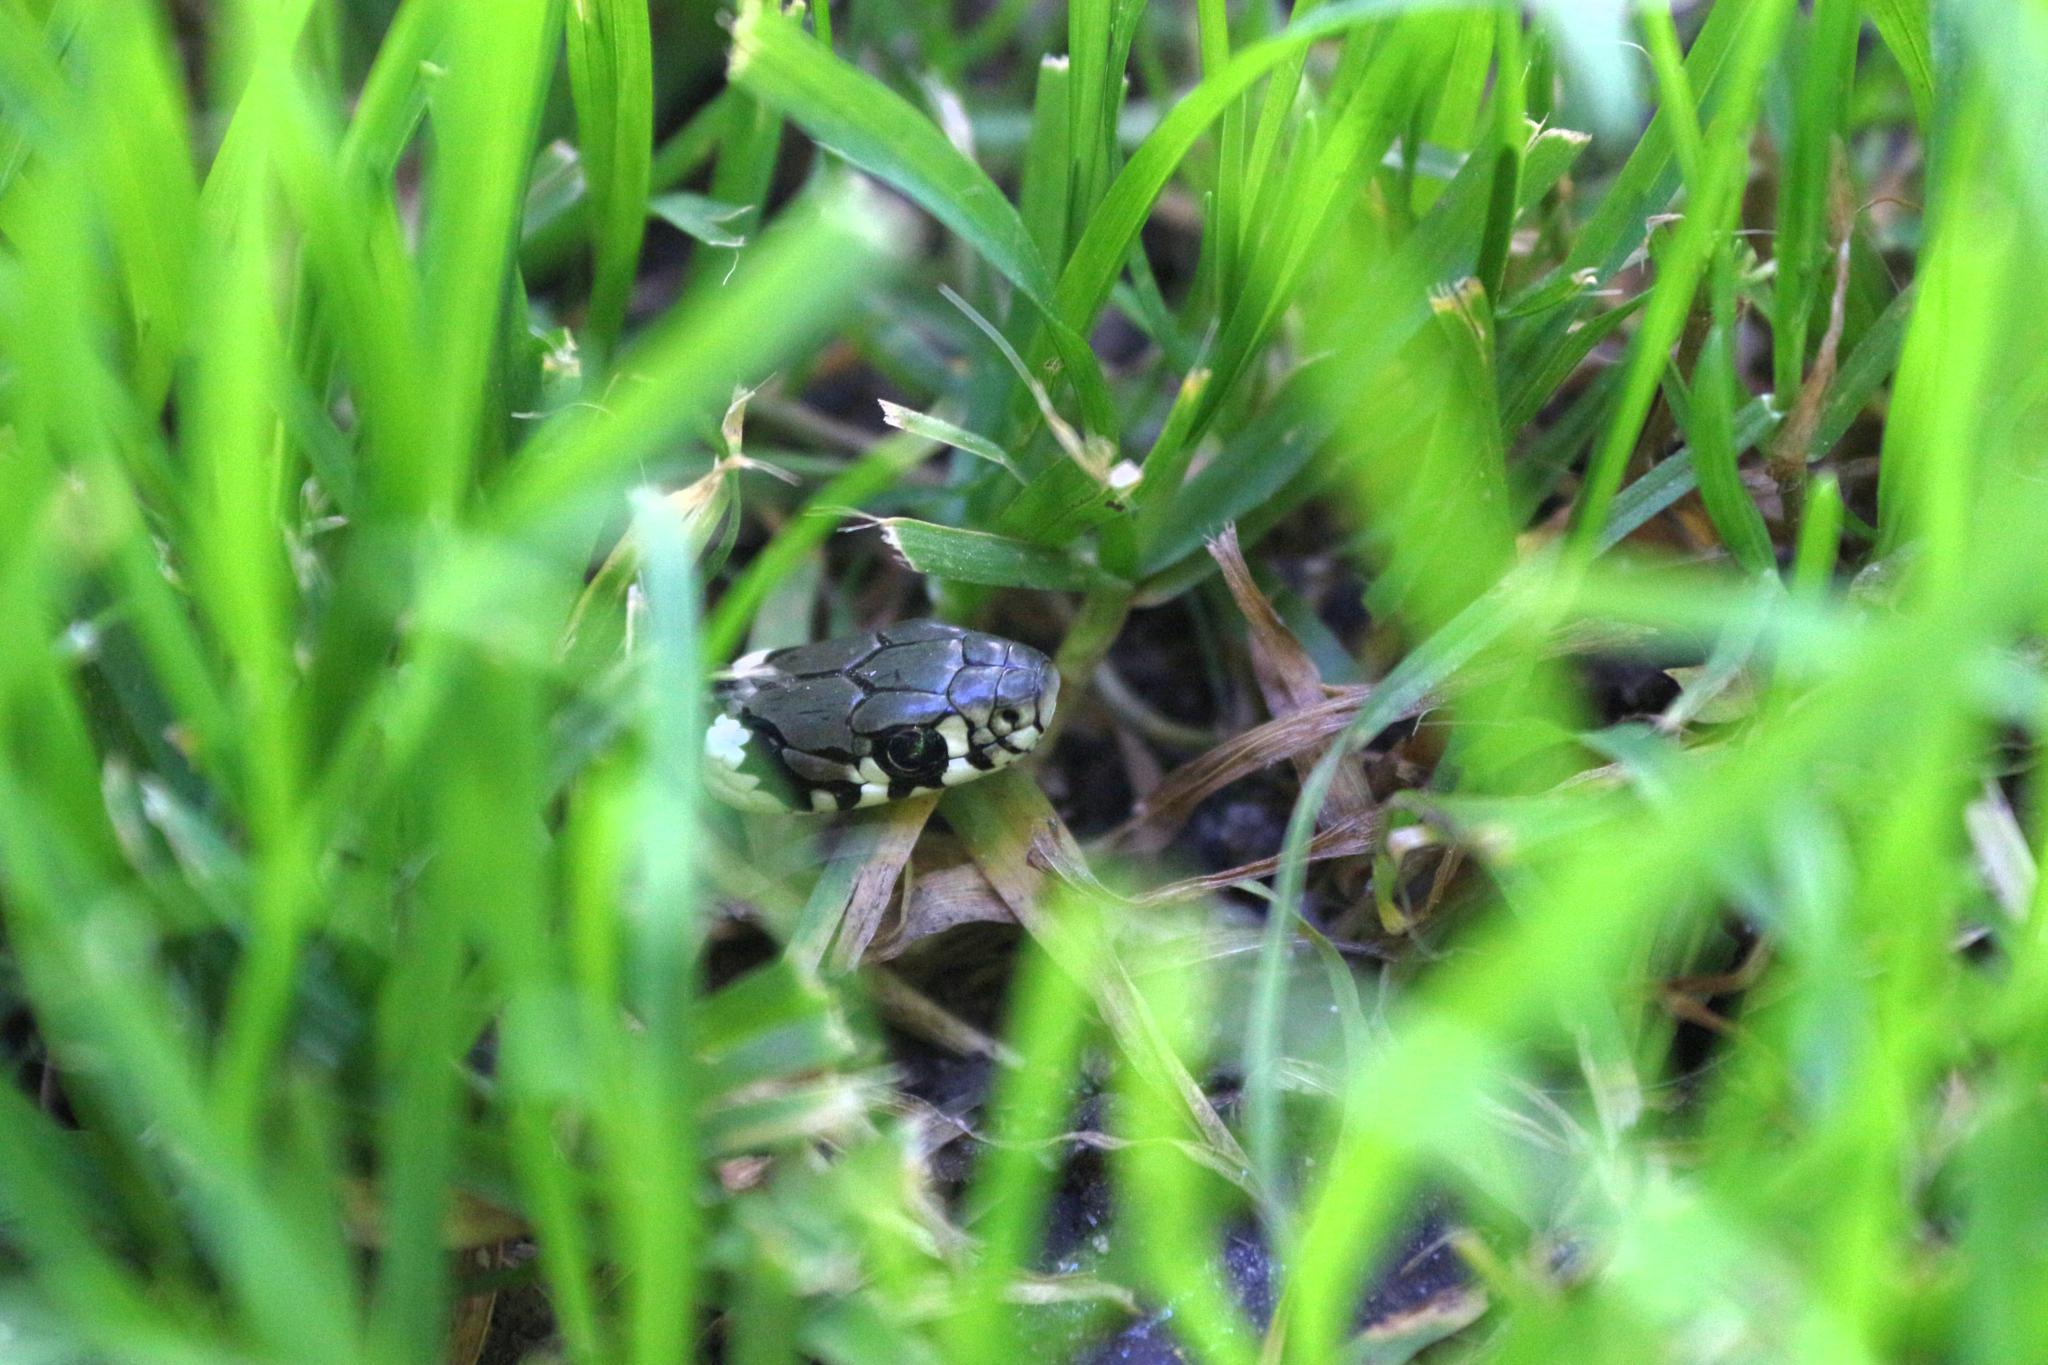 Snake in the grass by Andraž Sodja